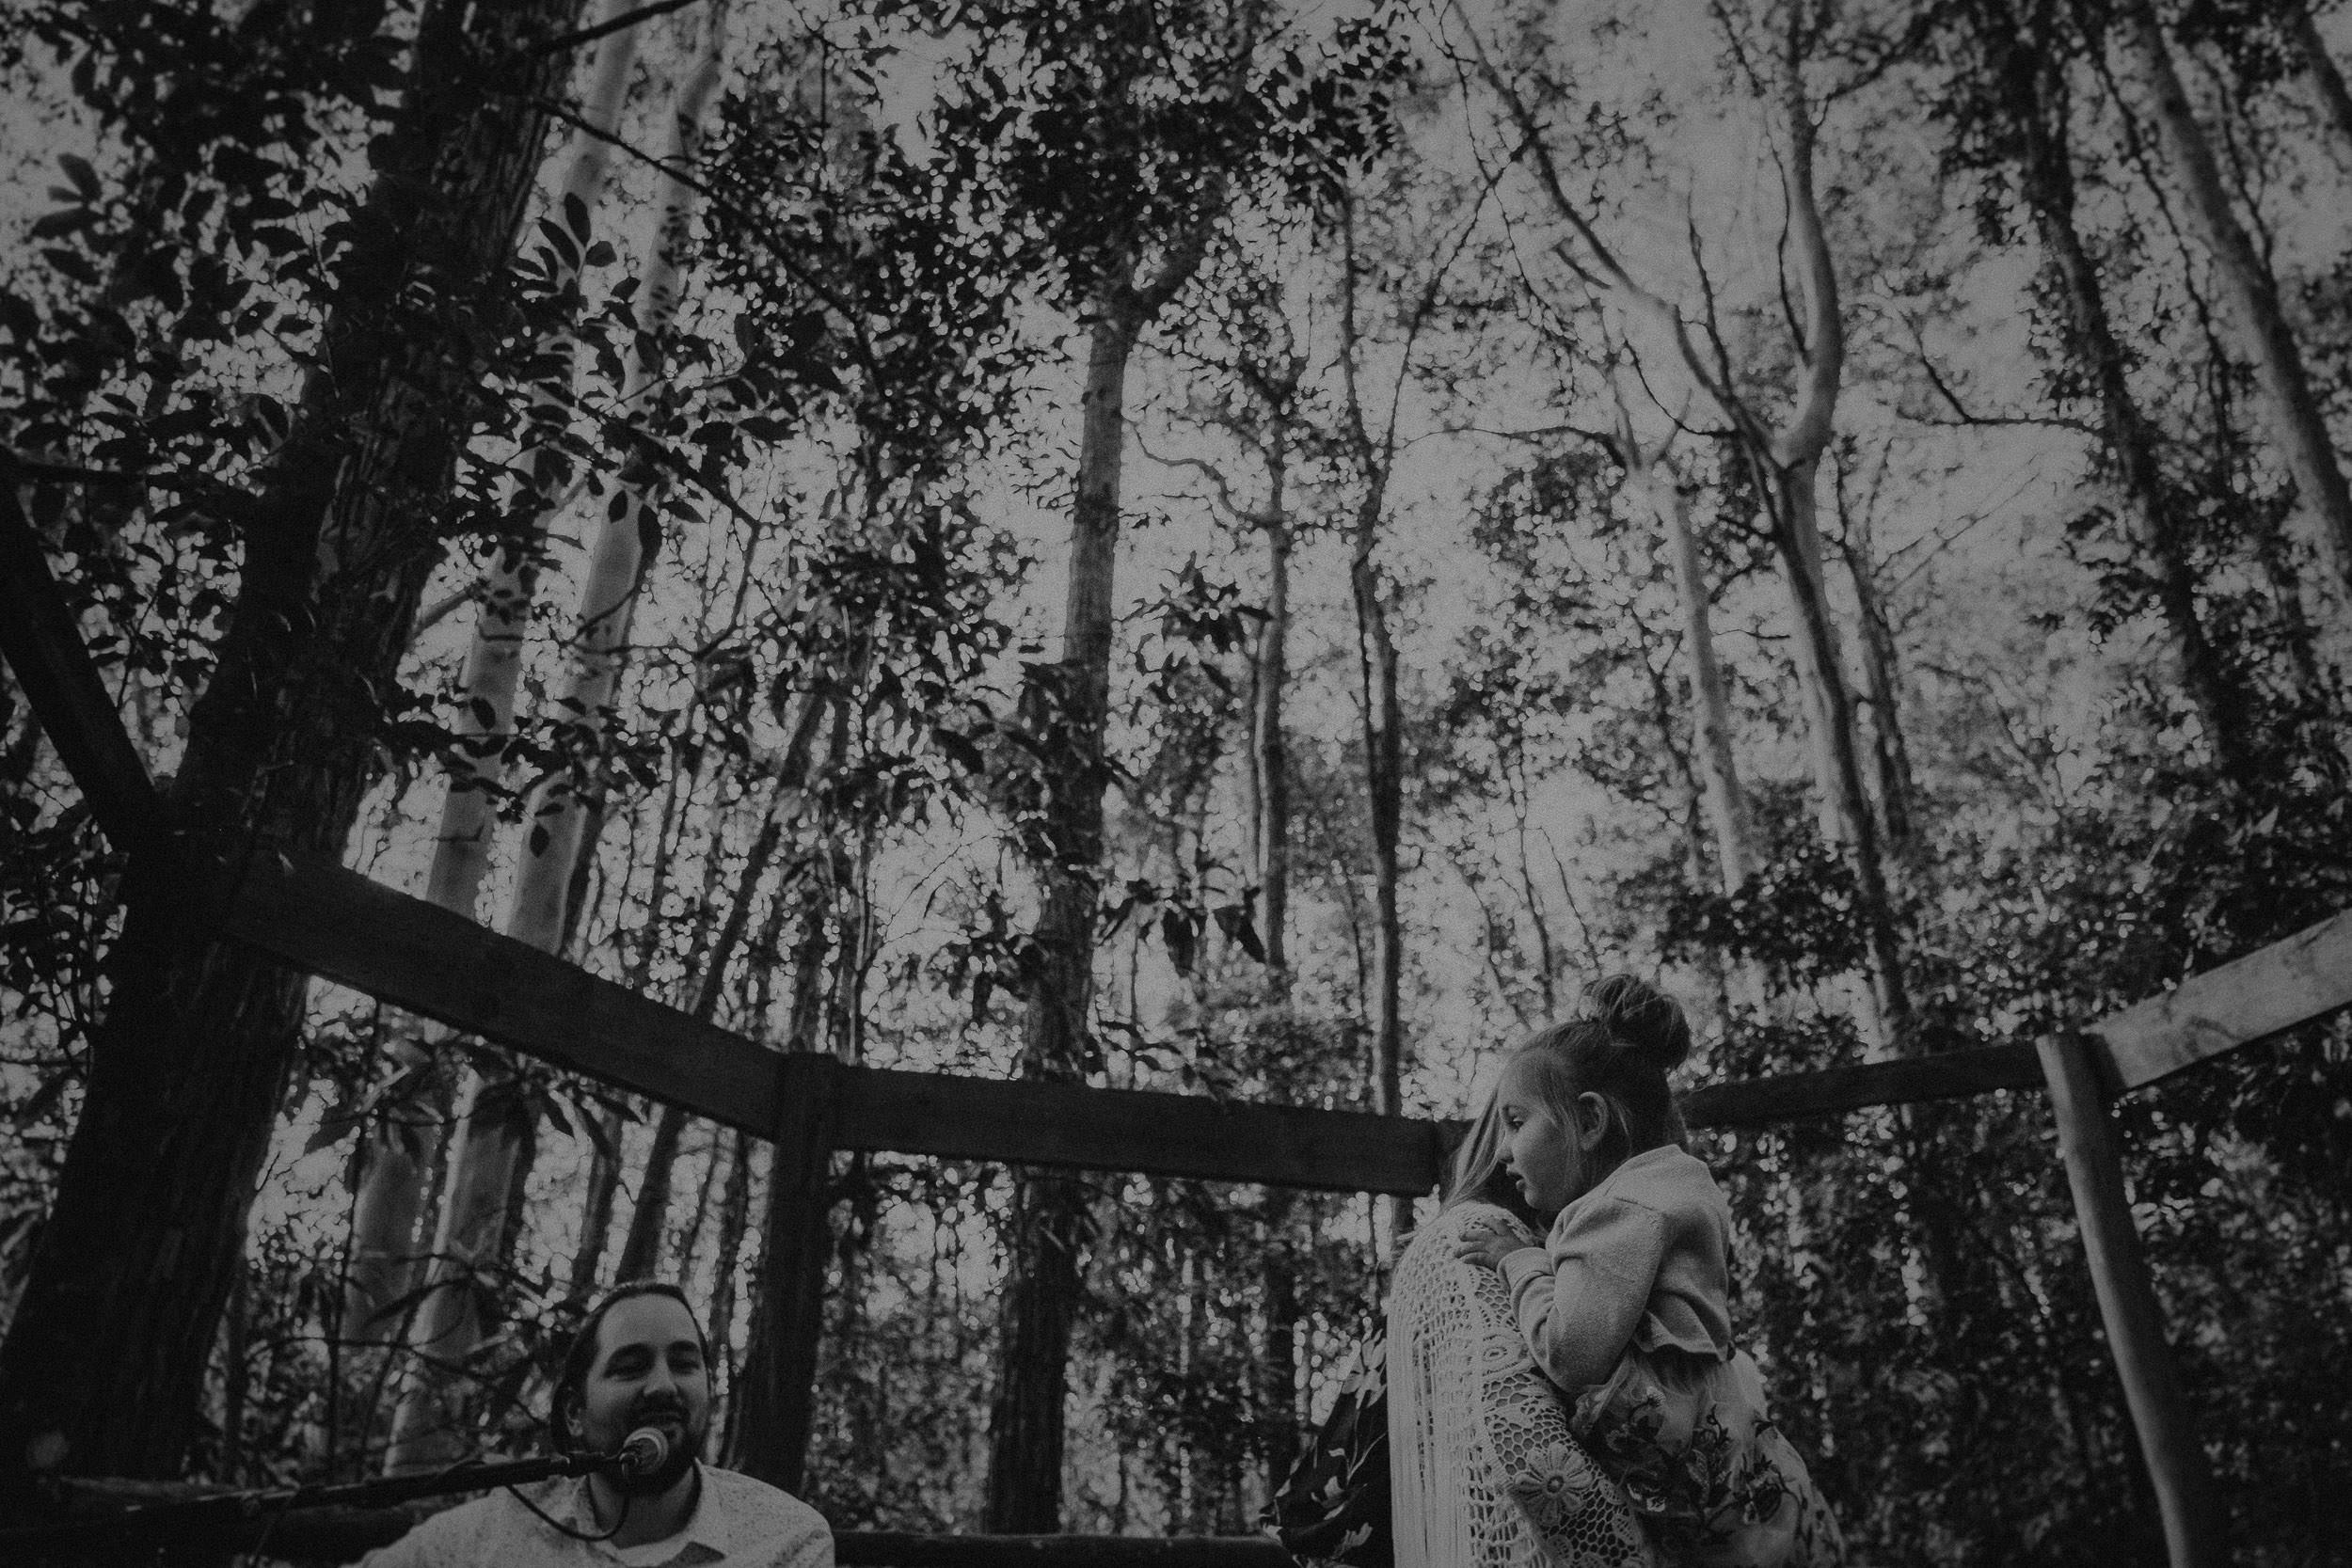 S&A Elopement - Kings & Thieves - Shred 'Til Dead - Central Coast Beach Forest Wedding - 277.jpg